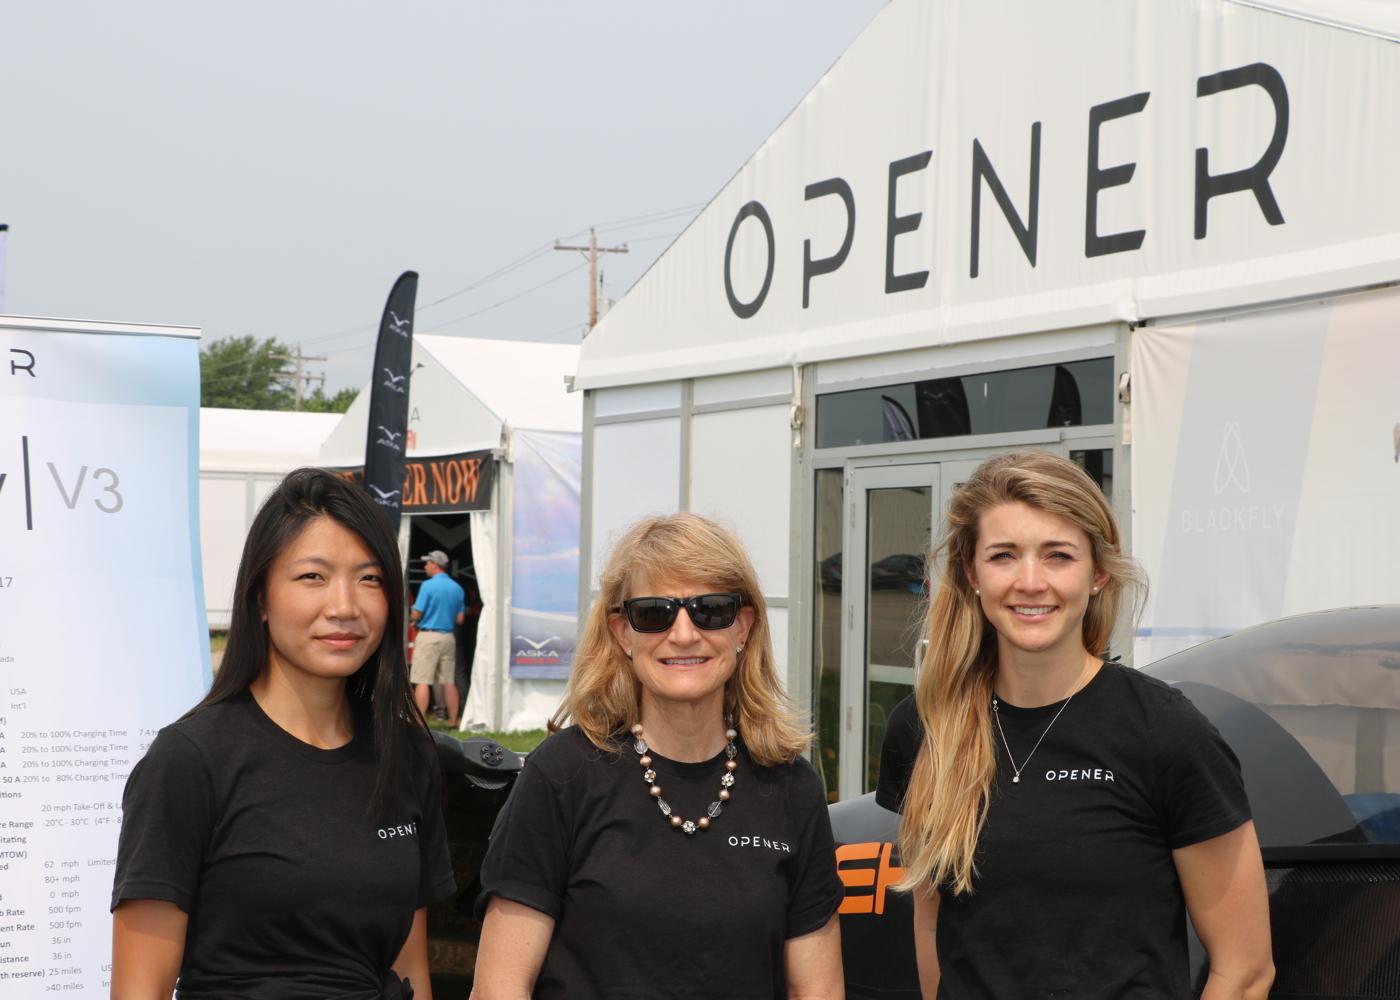 Opener Team